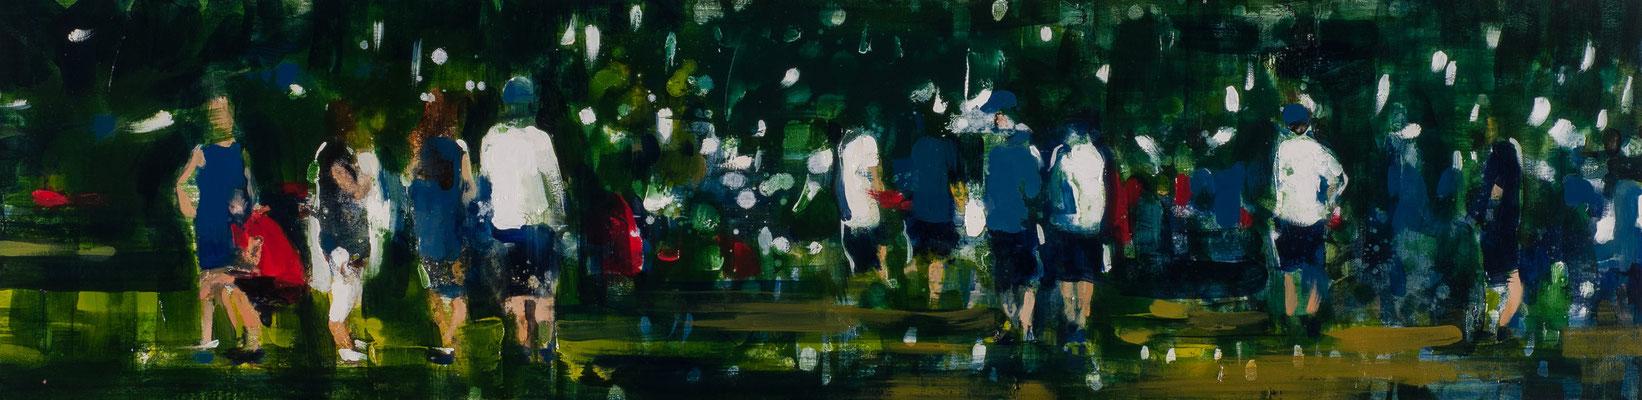 RENATA TUMAROVA  I  Parc stories  I  Öl auf Leinwand  I  30 x 120 cm